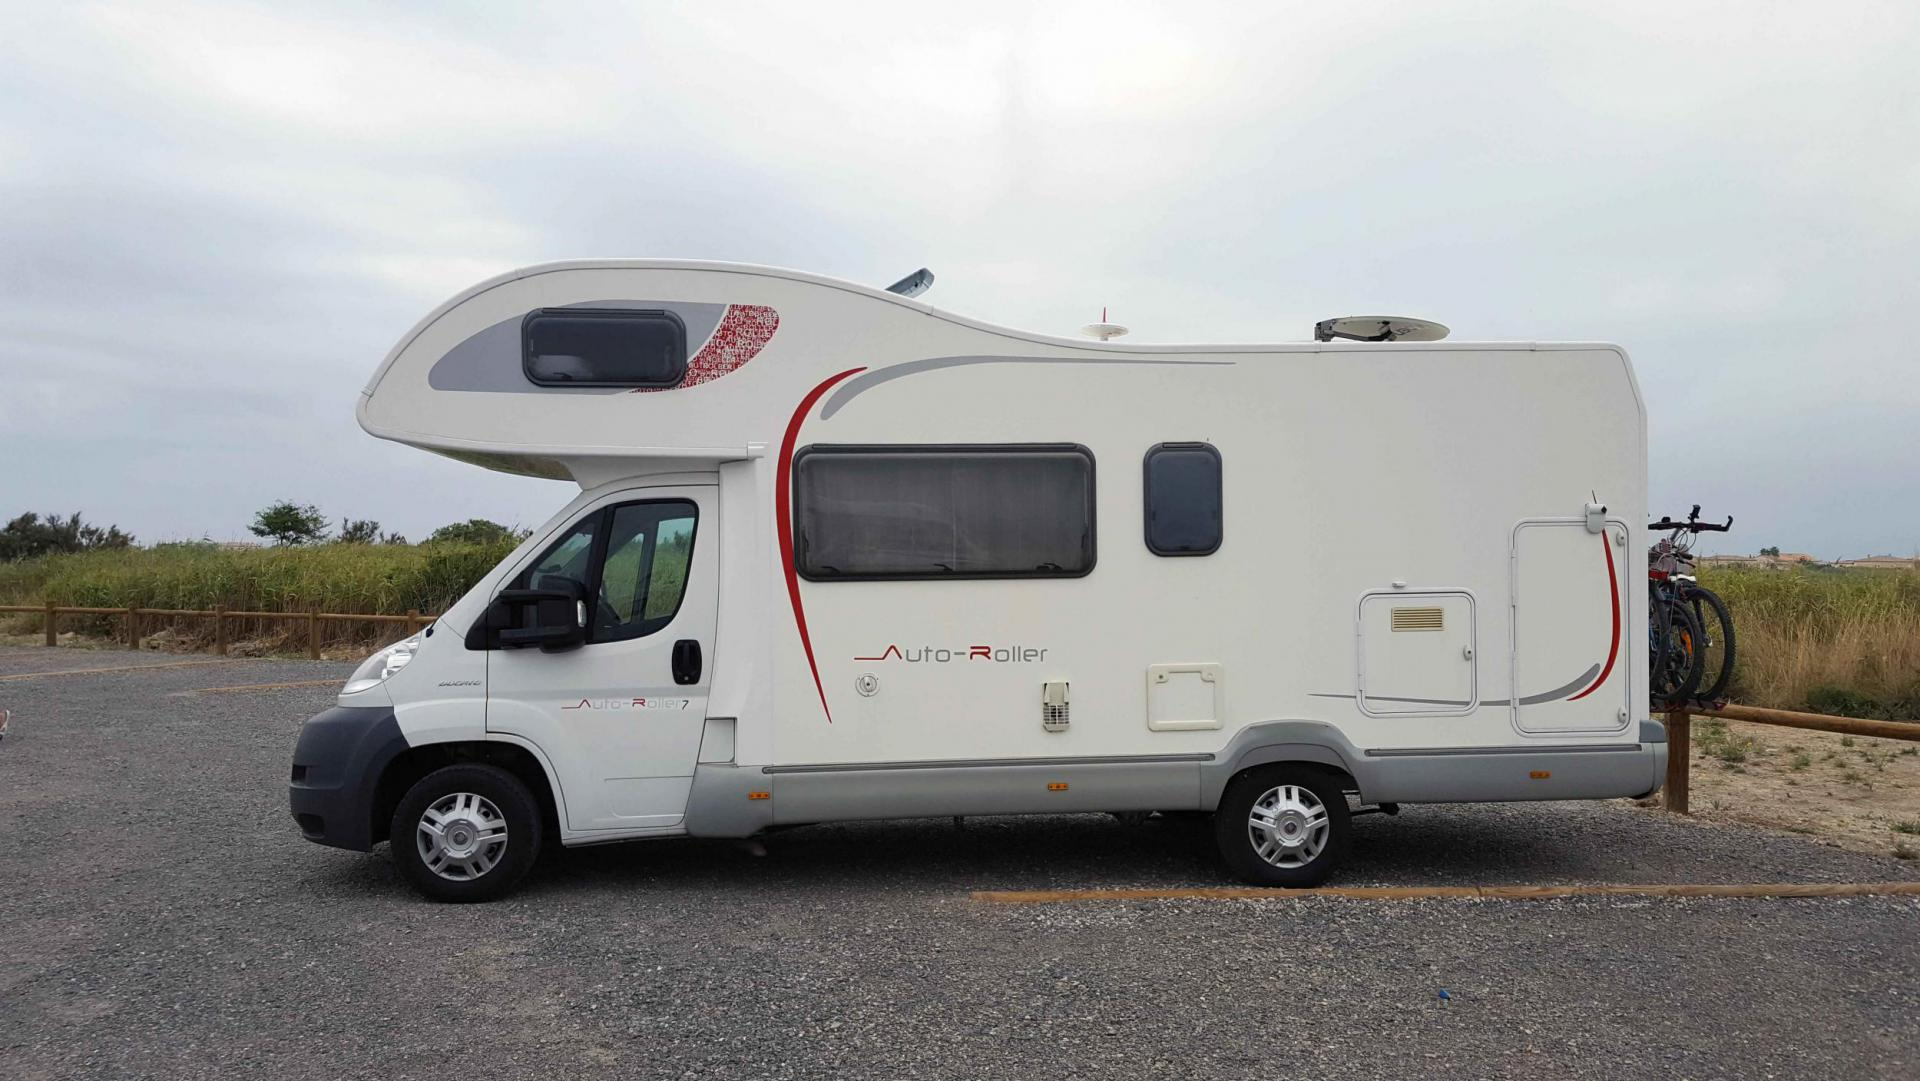 camping-car ROLLER TEAM AUTOROLLER 7